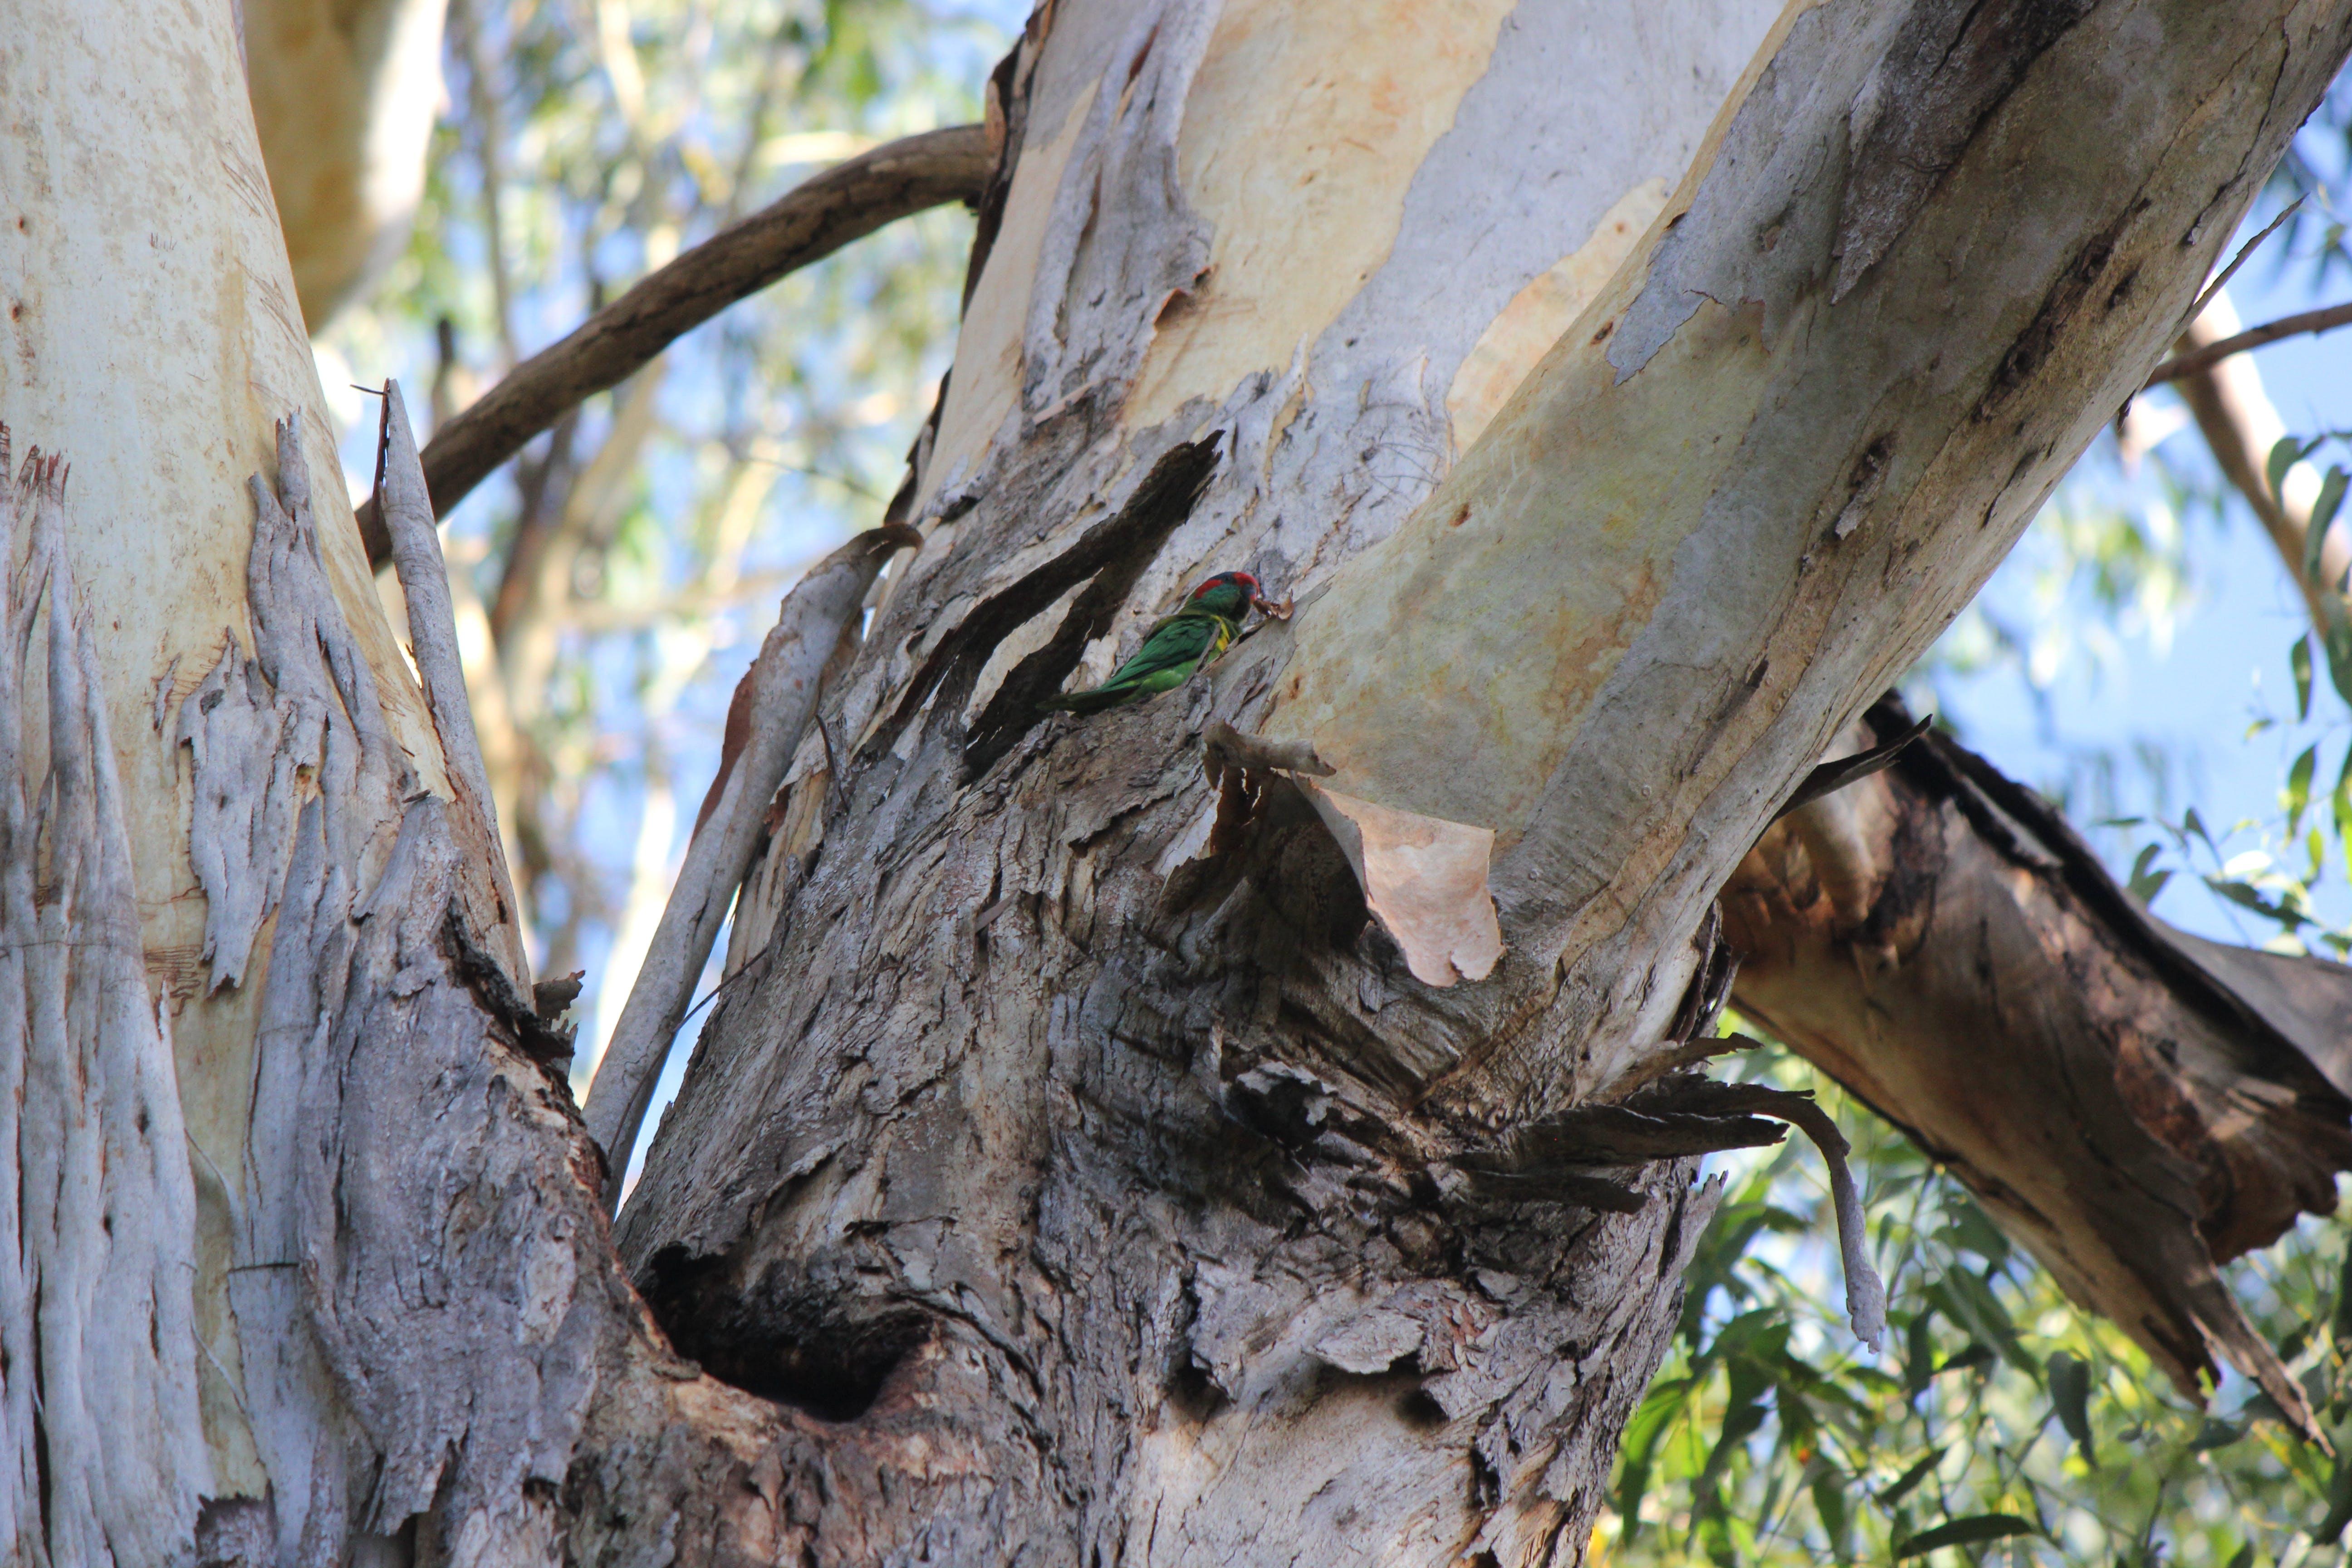 Musk lorikeet (Glossopsitta concinna)